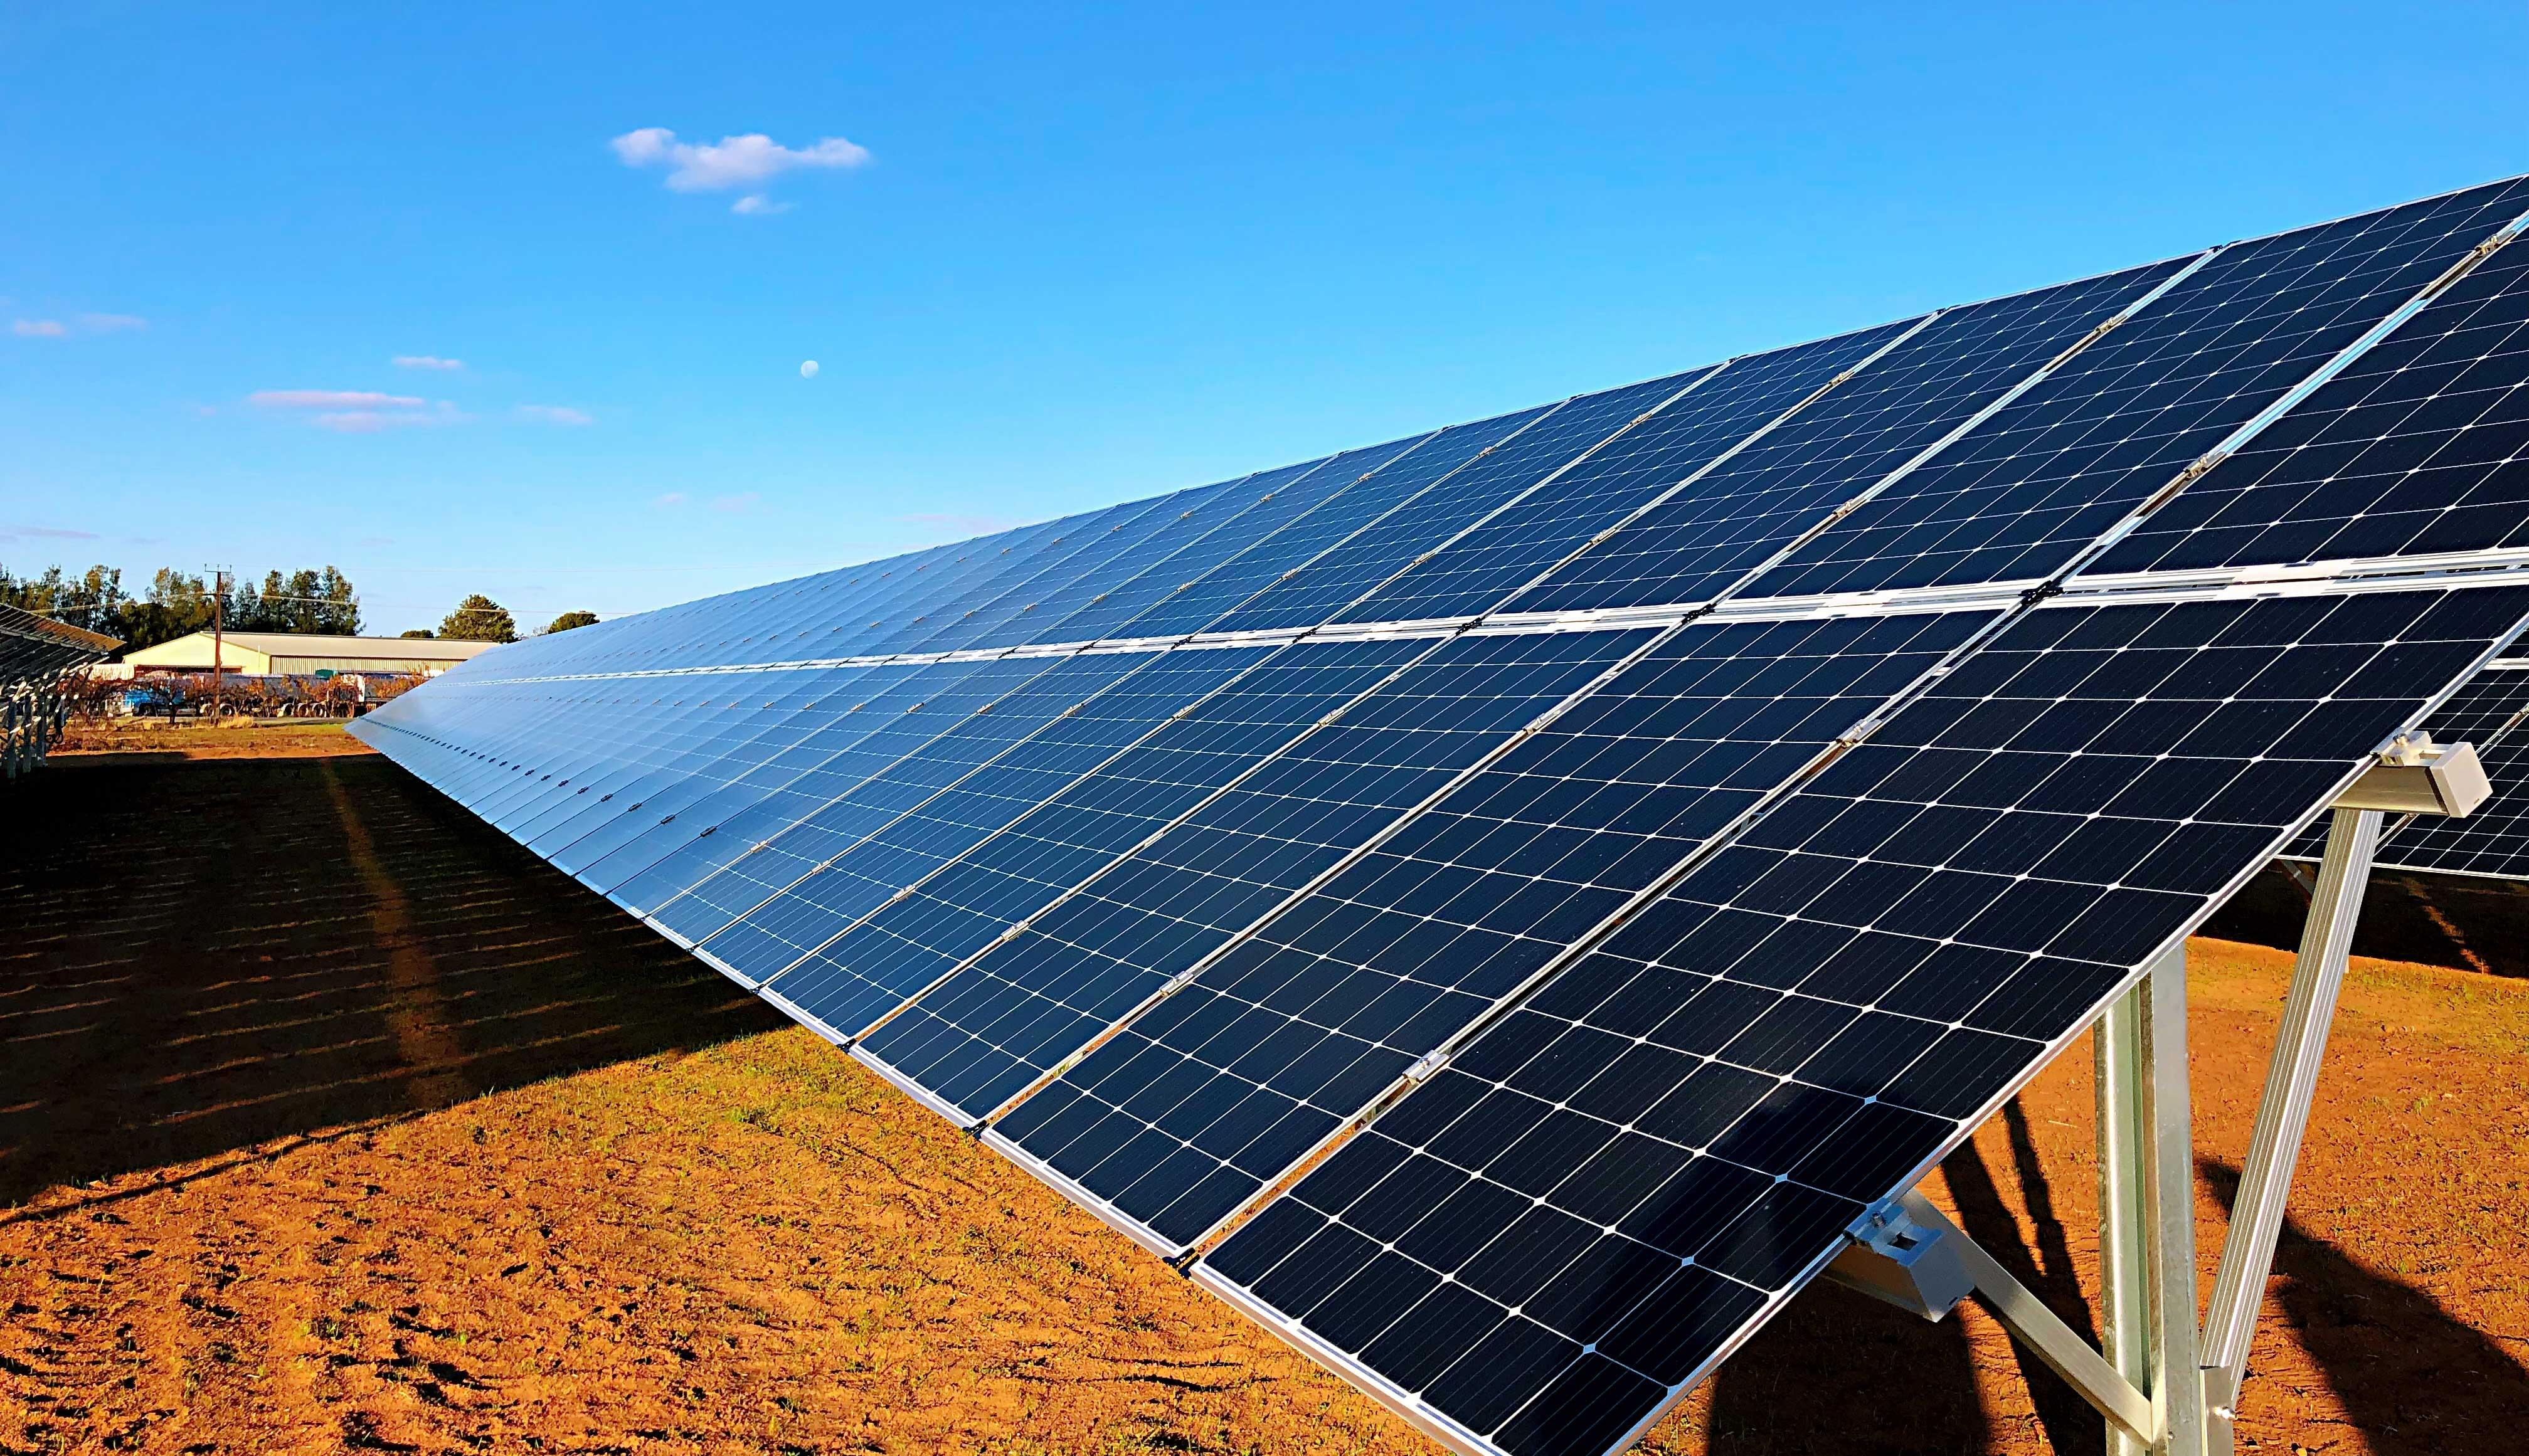 Uttarakhand Calls for Applications for Solar Project worth